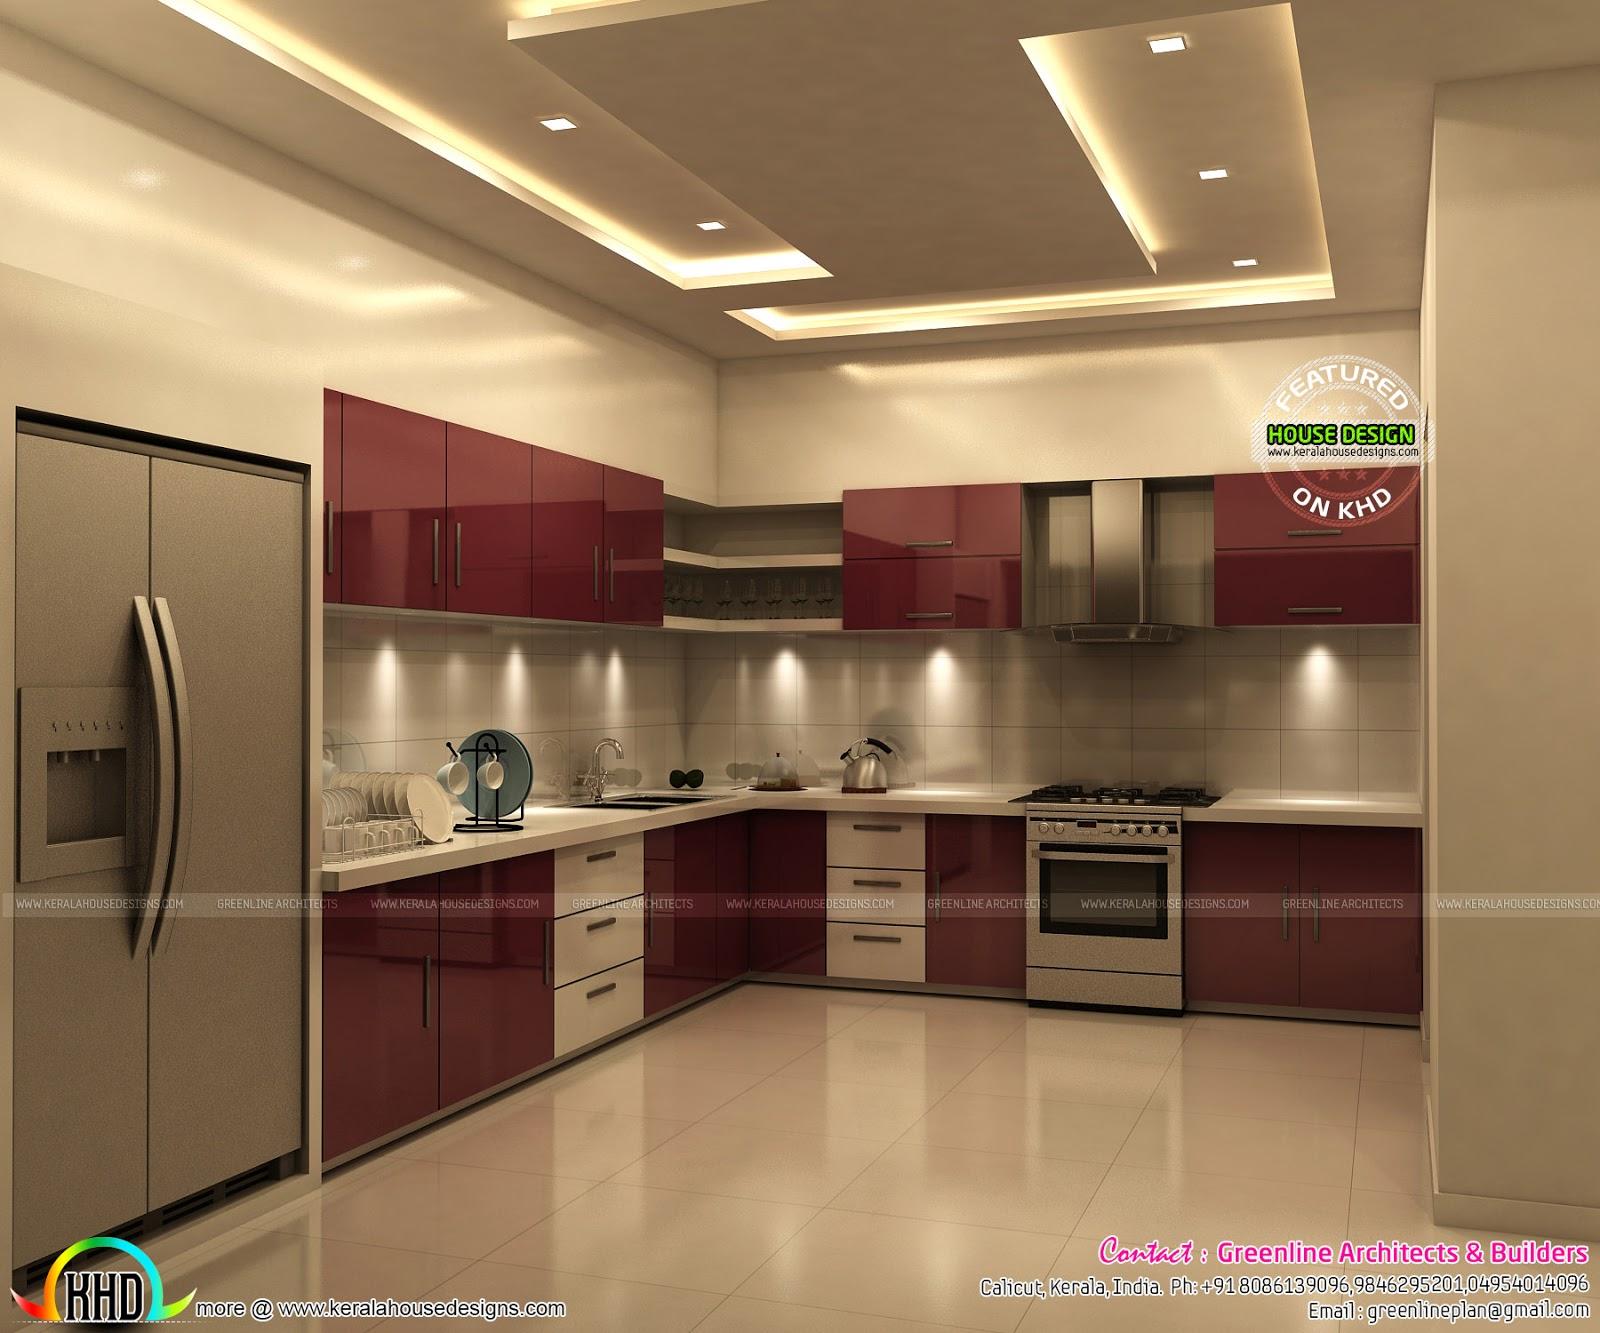 Interior Design Kitchen Sink Base Cabinet Sizes Superb And Bedroom Interiors Kerala Home